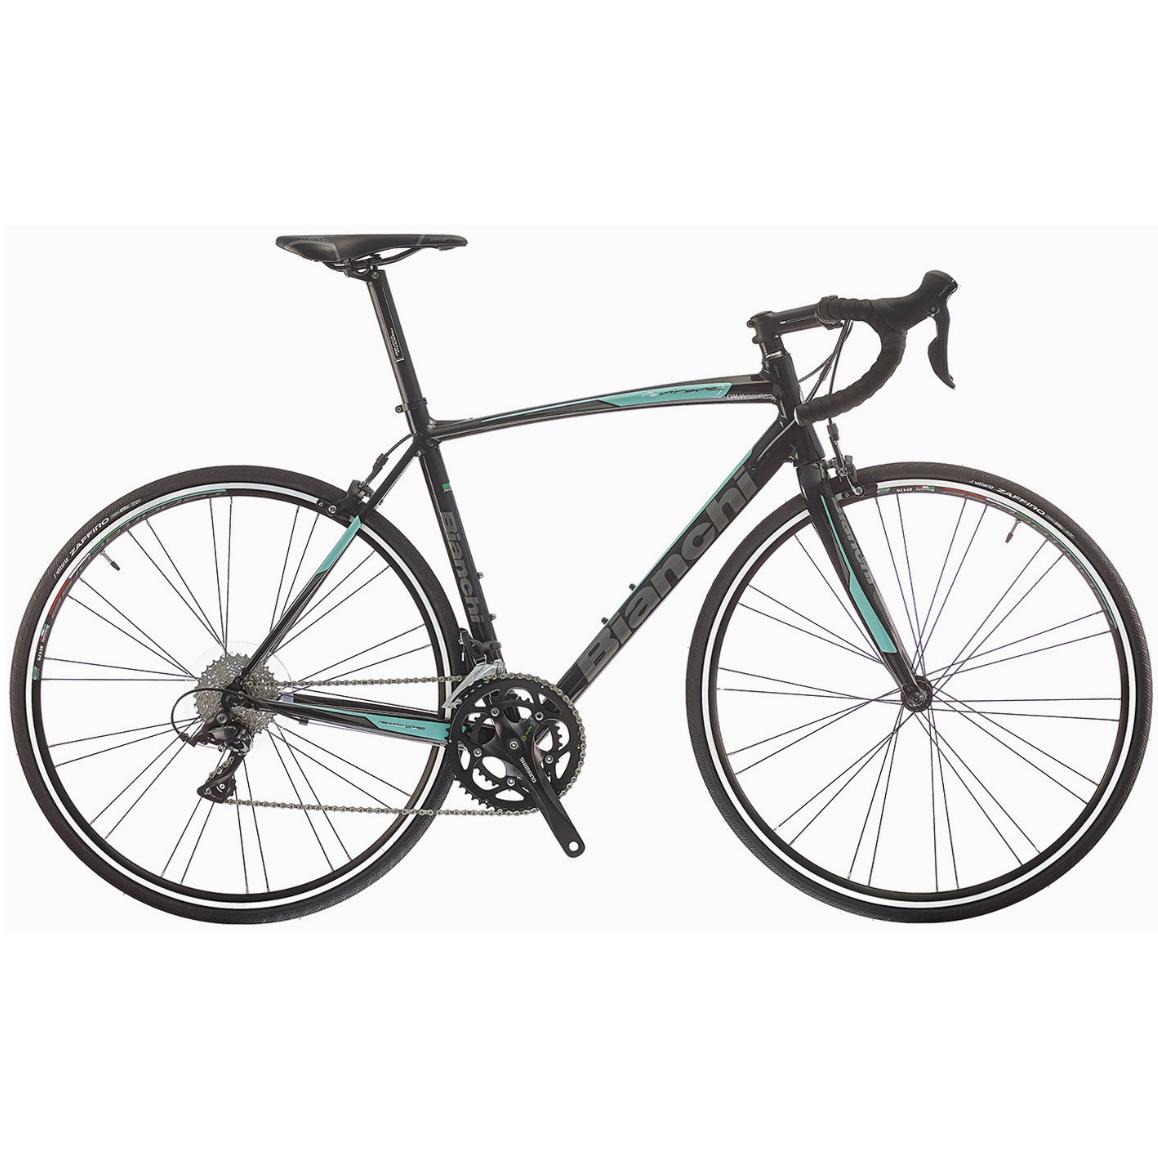 Bianchi Via Nirone 7 Sora Road Bike - 2018